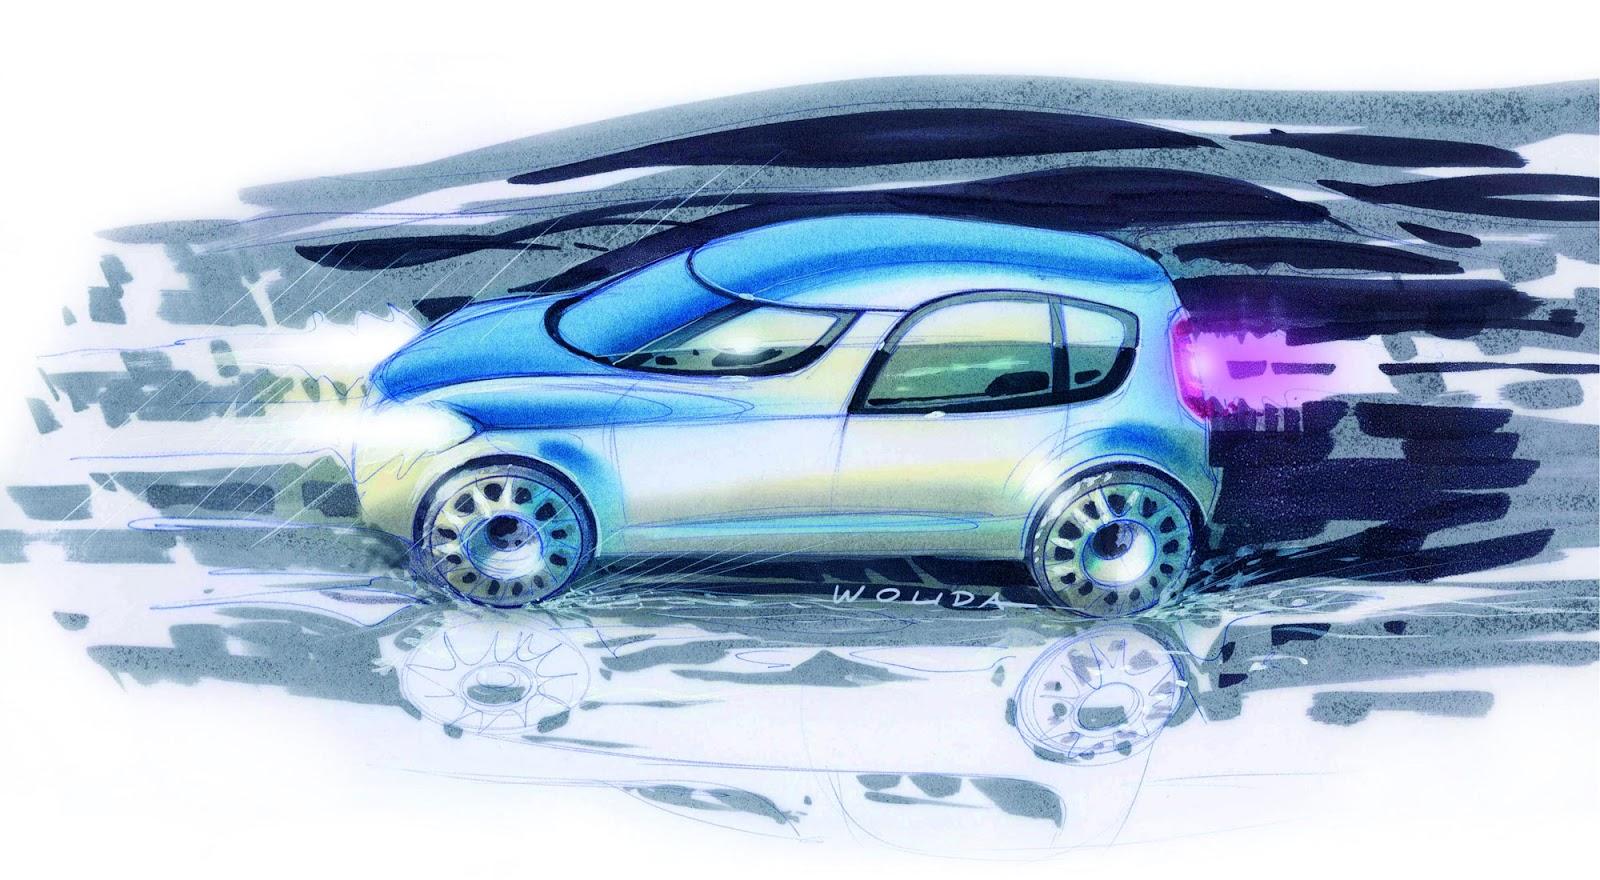 Skoda Roomster sketch by Peter Wouda - final theme artwork